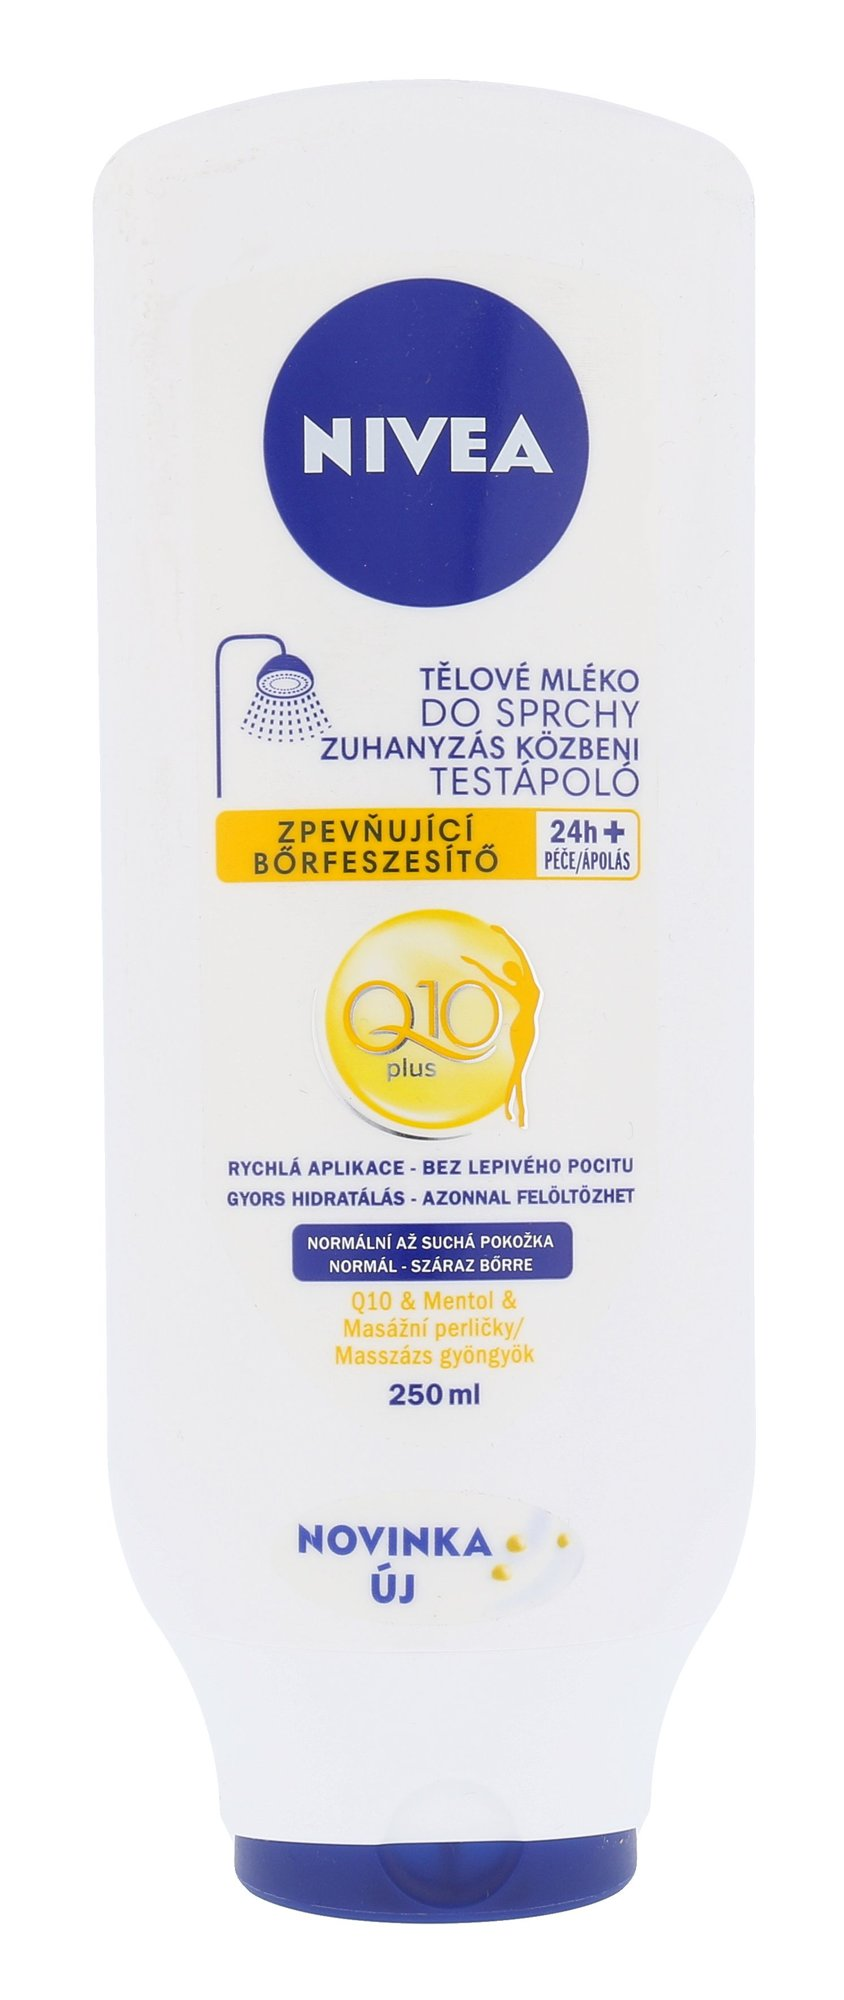 Nivea Q10 Plus Cosmetic 250ml